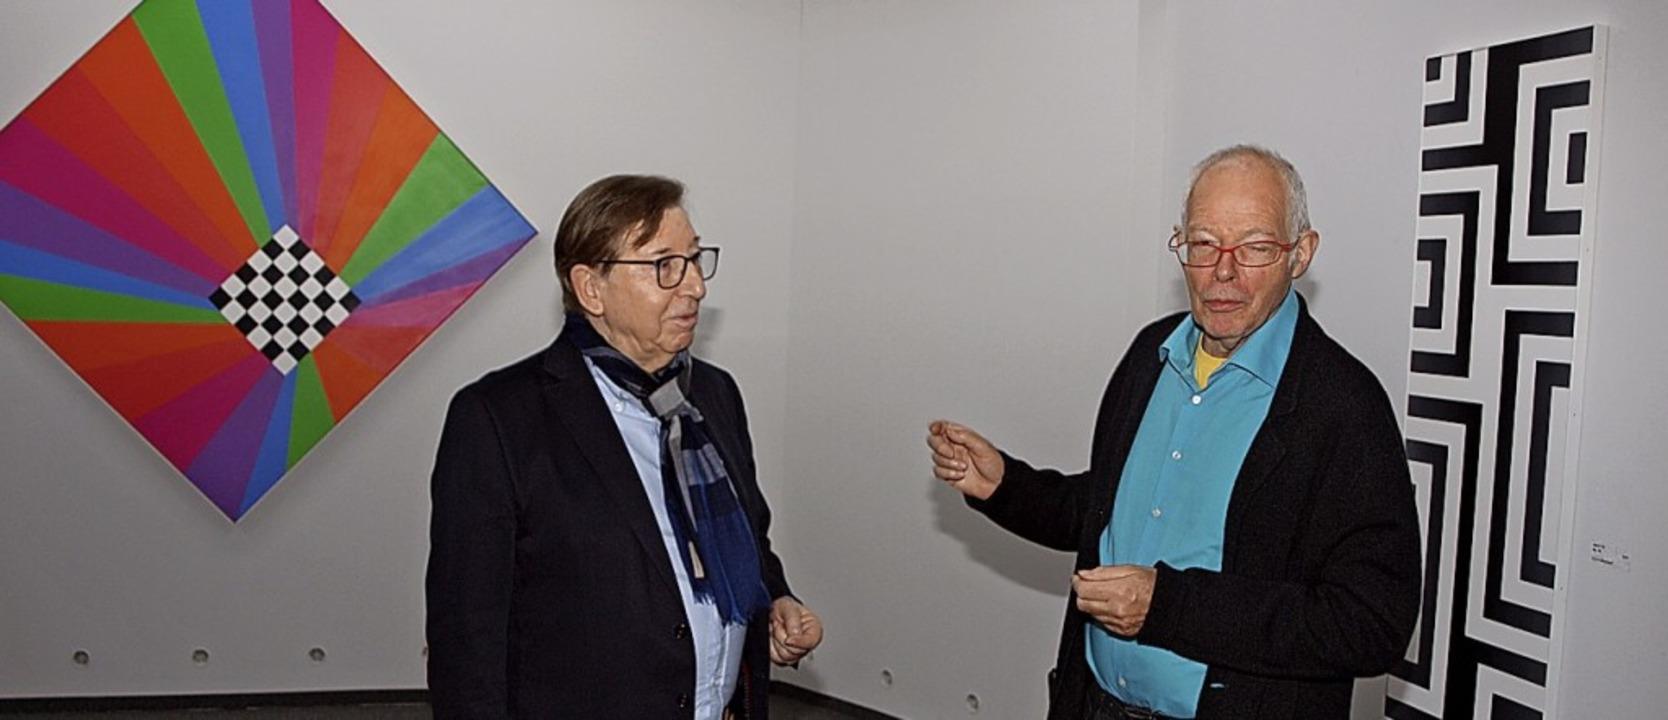 Kurator Jakob Bill (rechts) und Jürgen Messmer.  | Foto: Michael Haberer